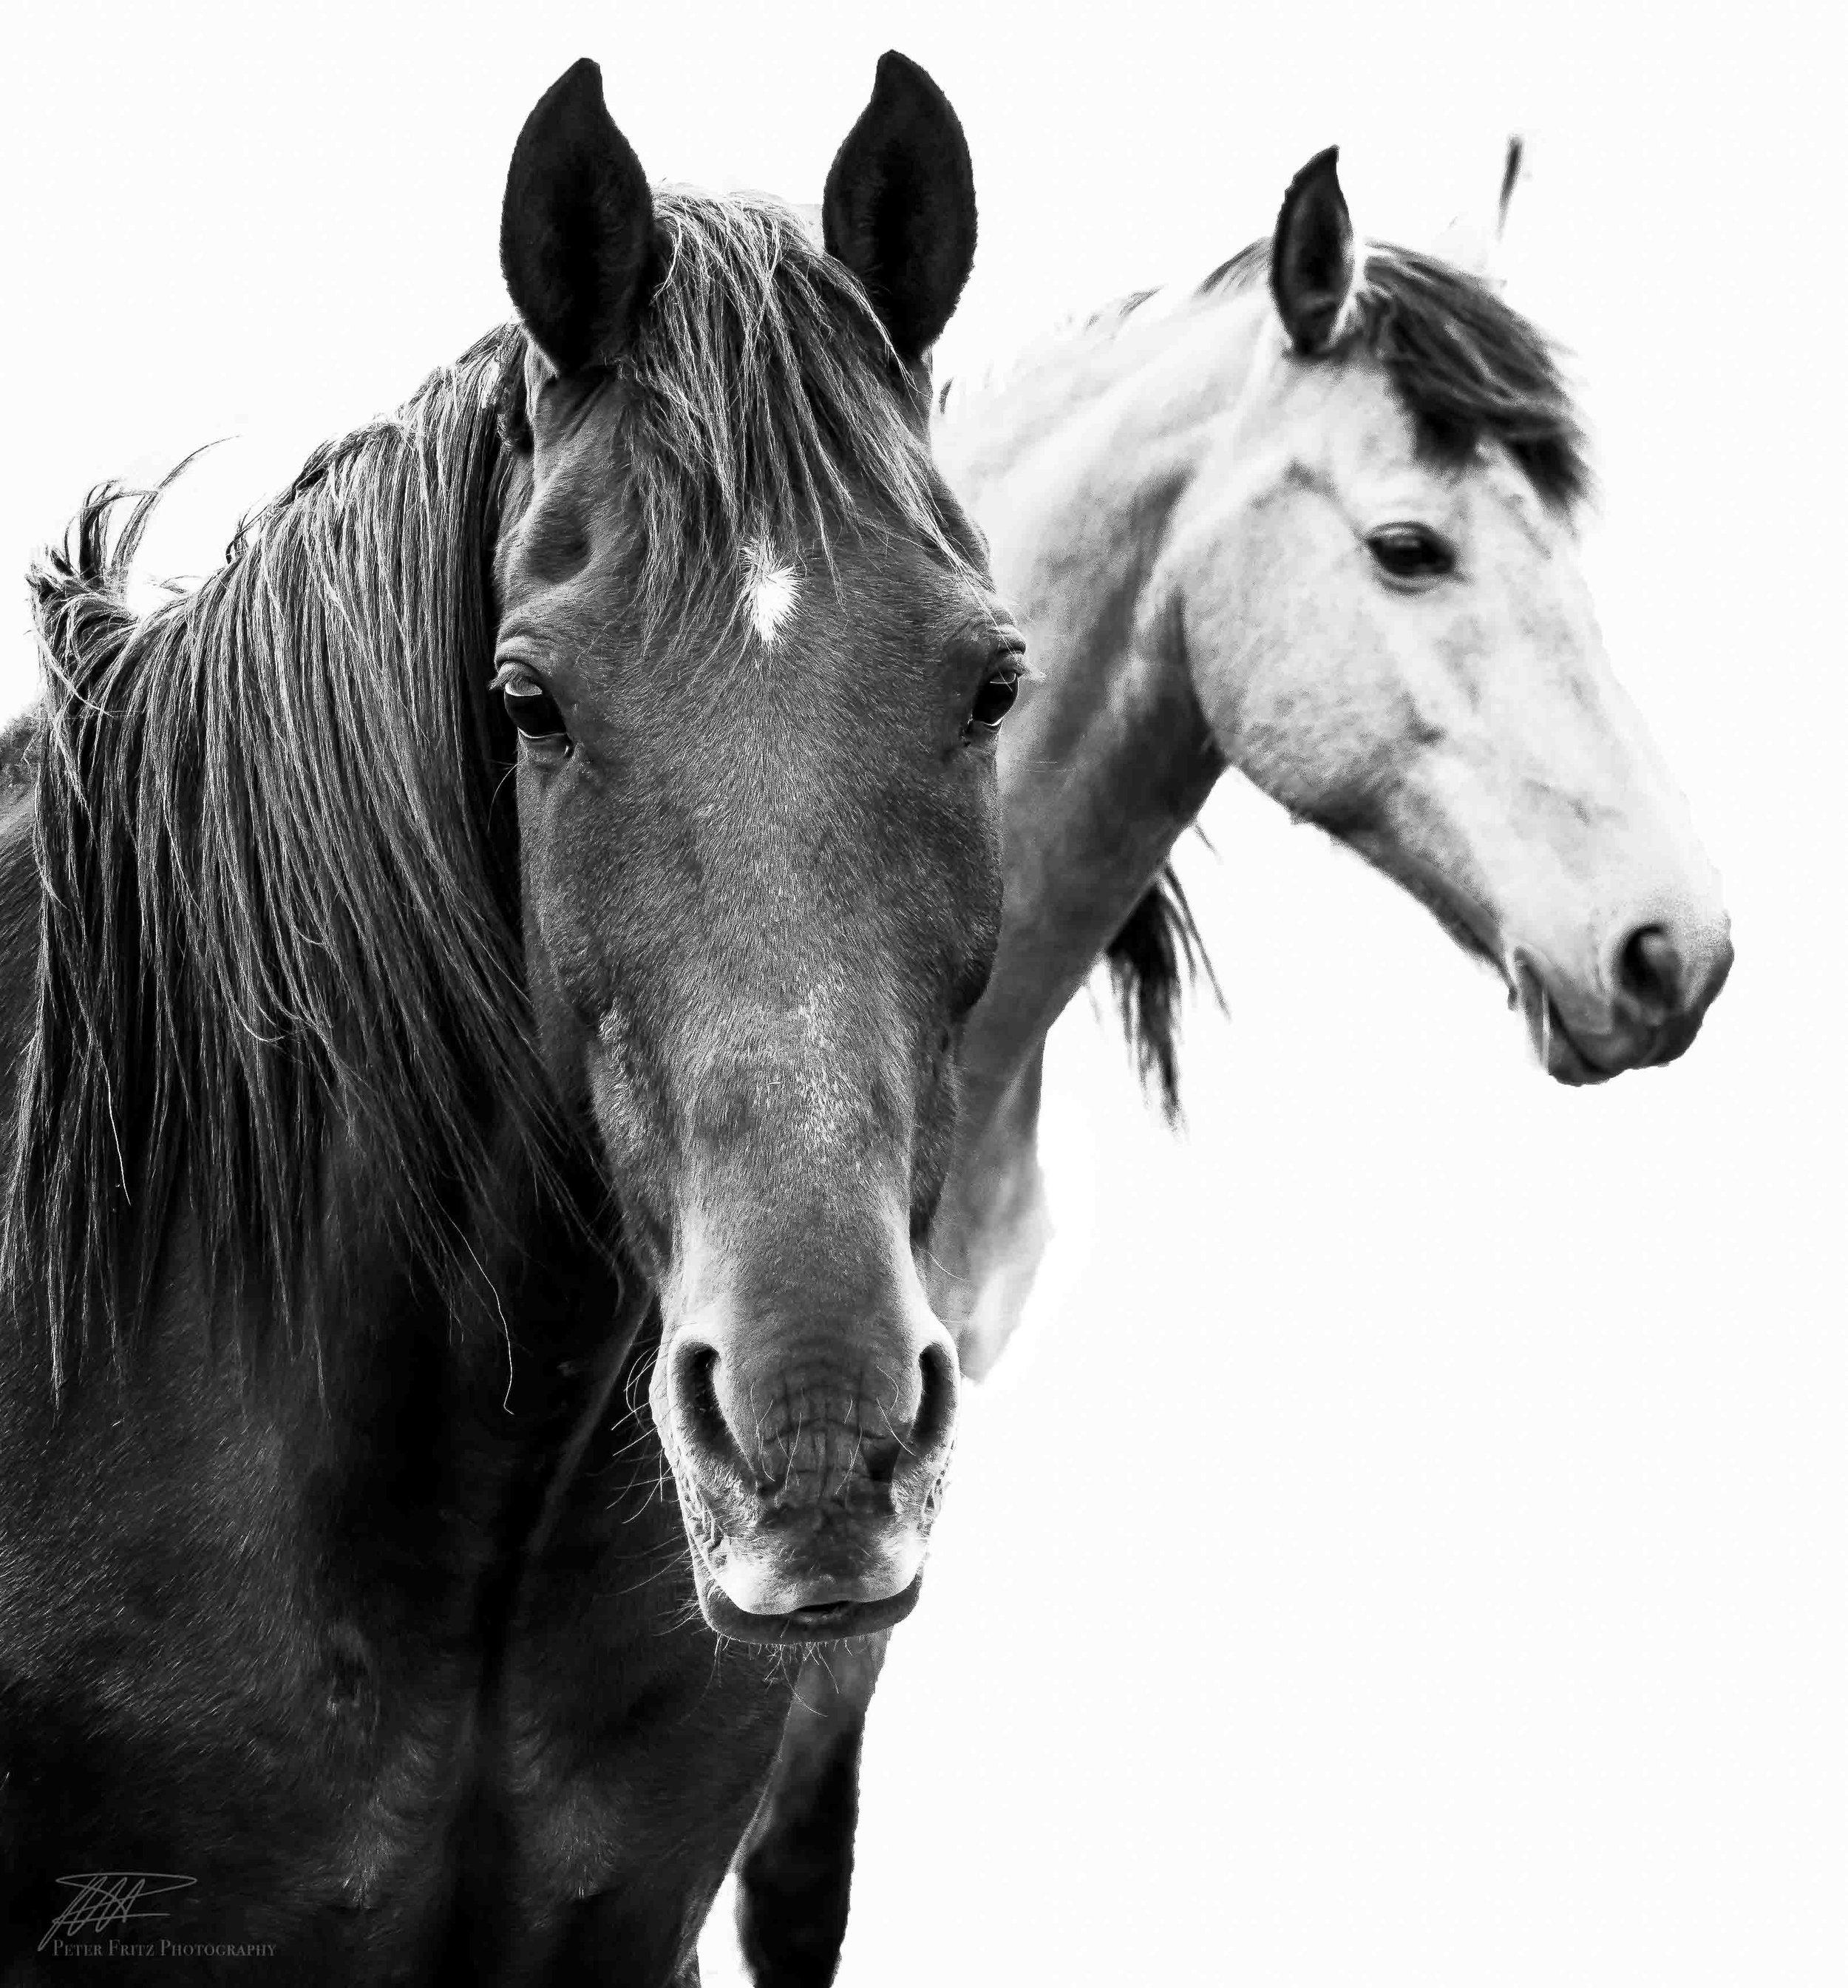 Horses 1x1 bnw web.jpg